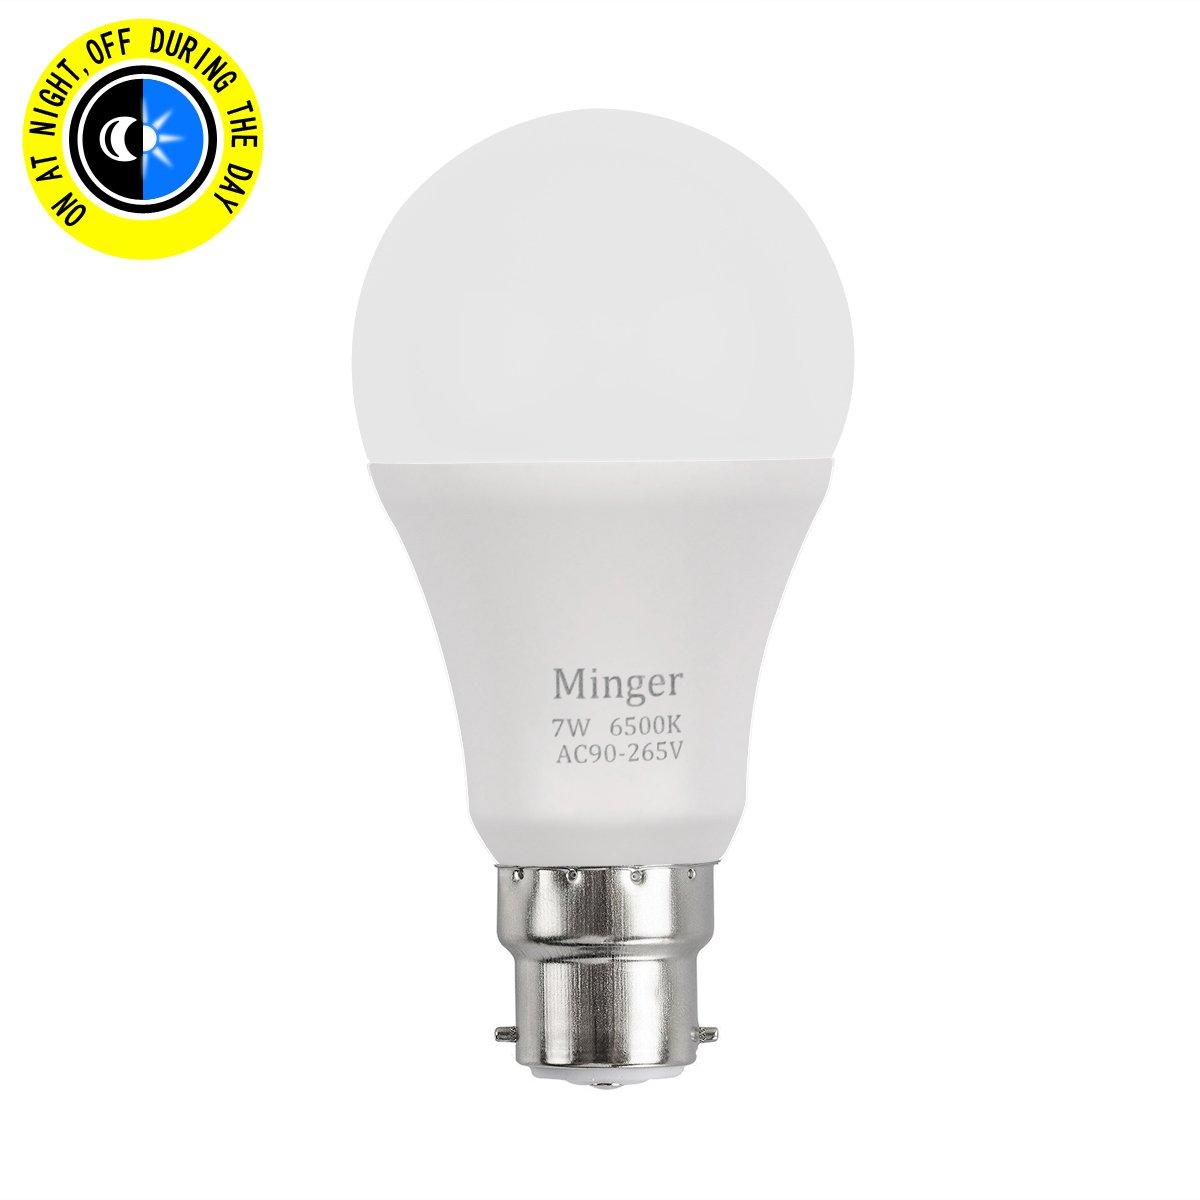 dawn to dusk light. Sensor Light Bulb MINGER 600lm 7W B22 Bayonet Smart Automatic Dusk To Dawn LED Bulbs With L